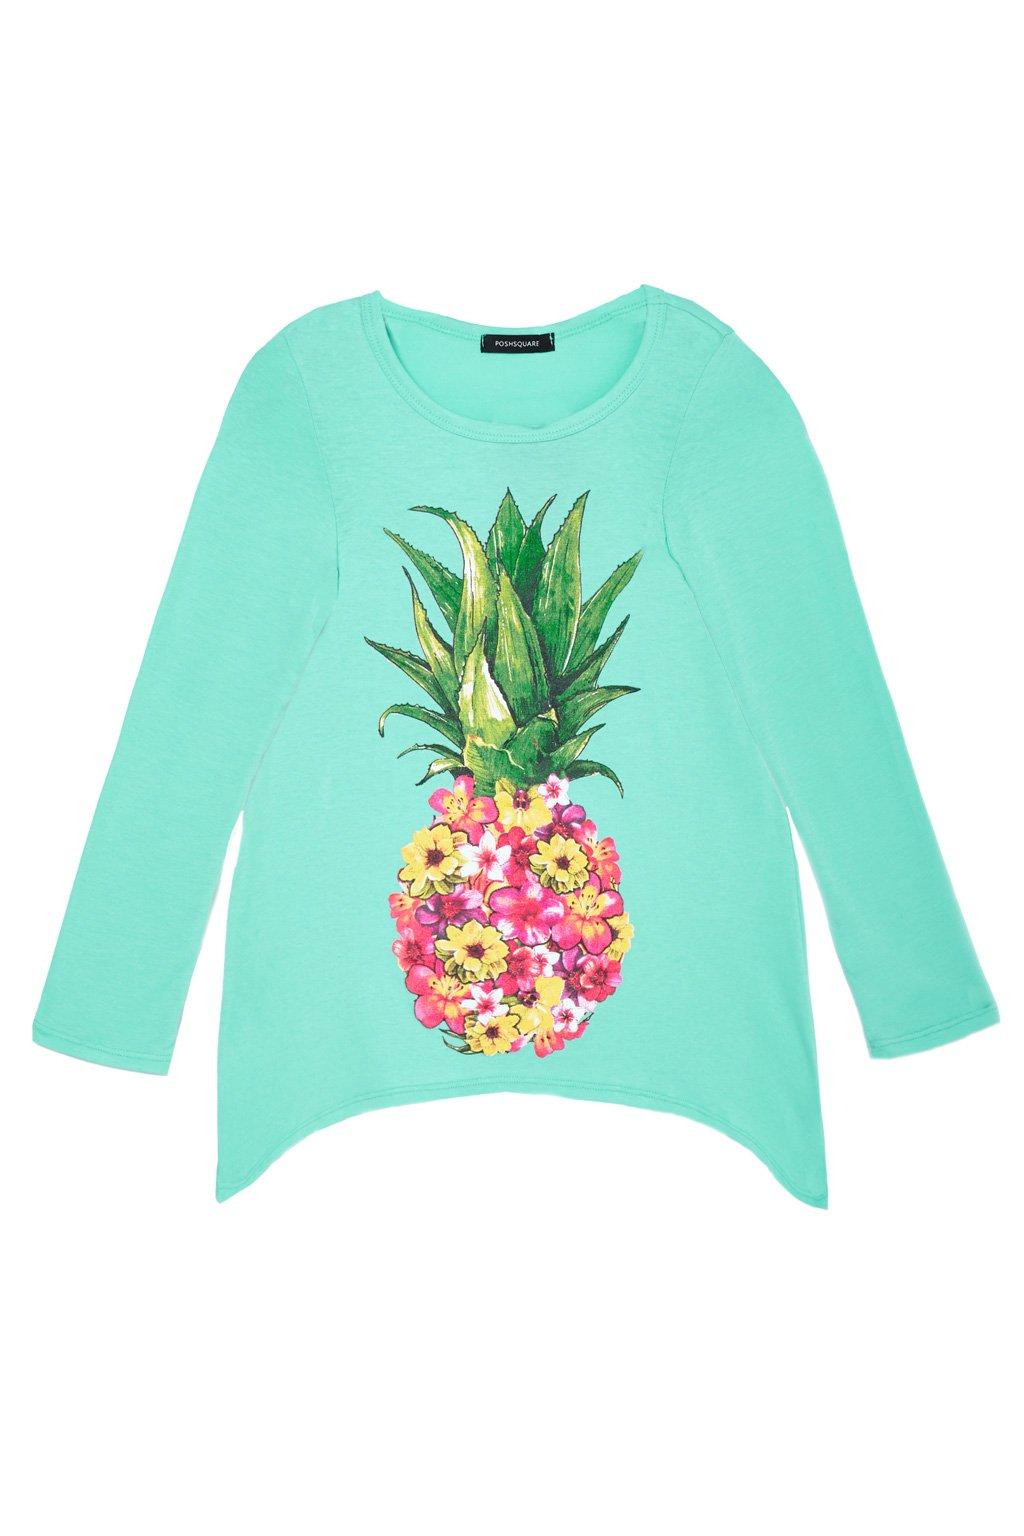 Big Girls Long Sleeve Love Heart Pineapple Graphic Handkerchief Tee Top USA Aqua Floral M by Poshsquare (Image #1)